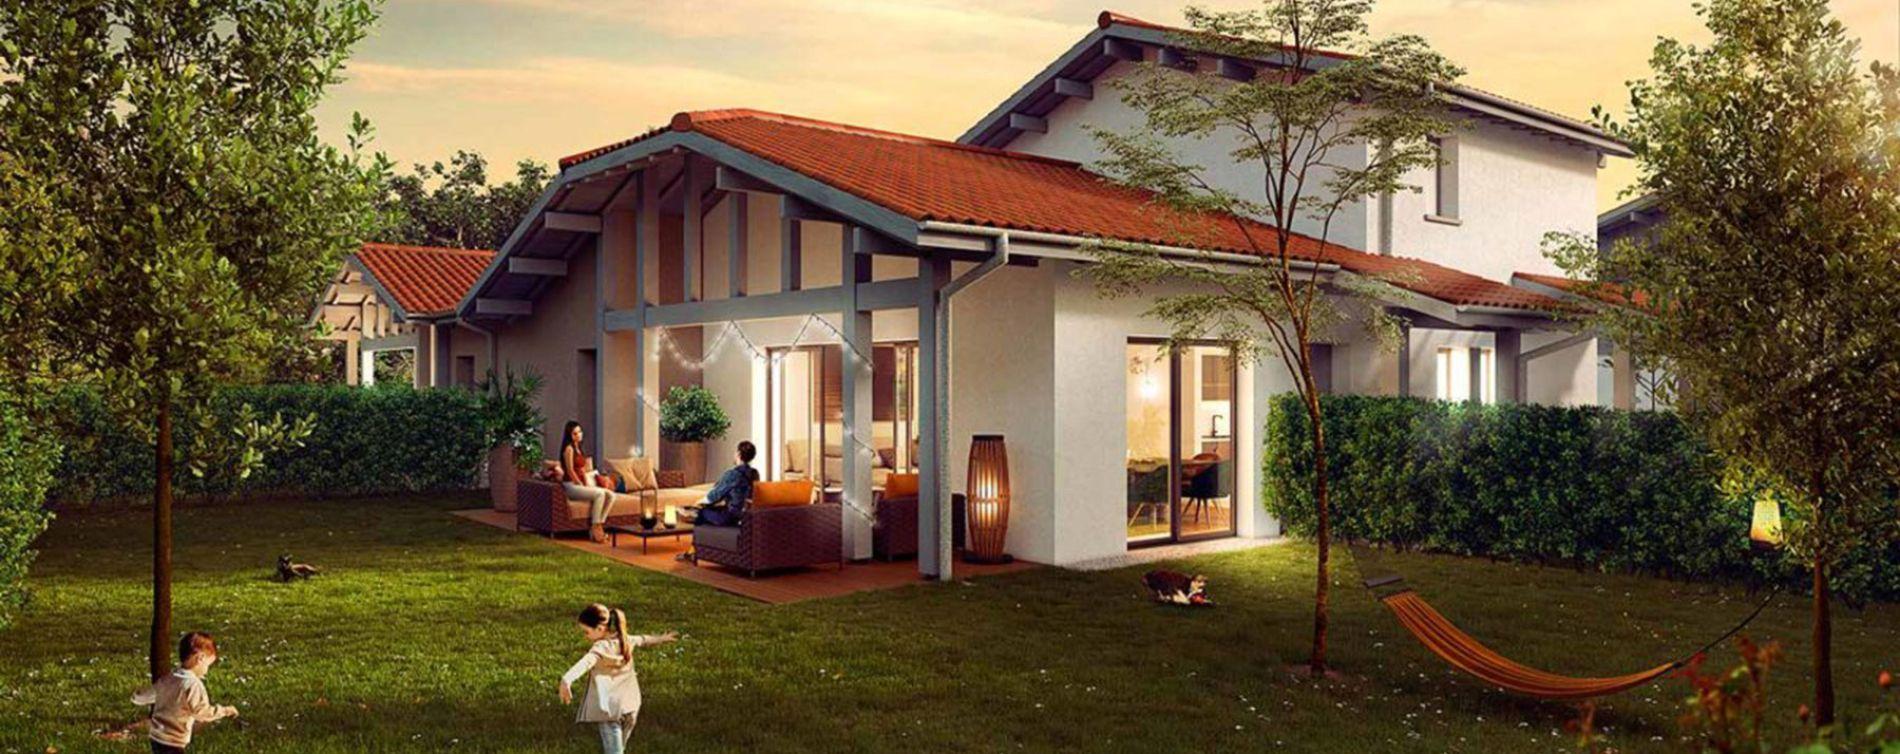 Soorts-Hossegor : programme immobilier neuve « Programme immobilier n°219043 » en Loi Pinel